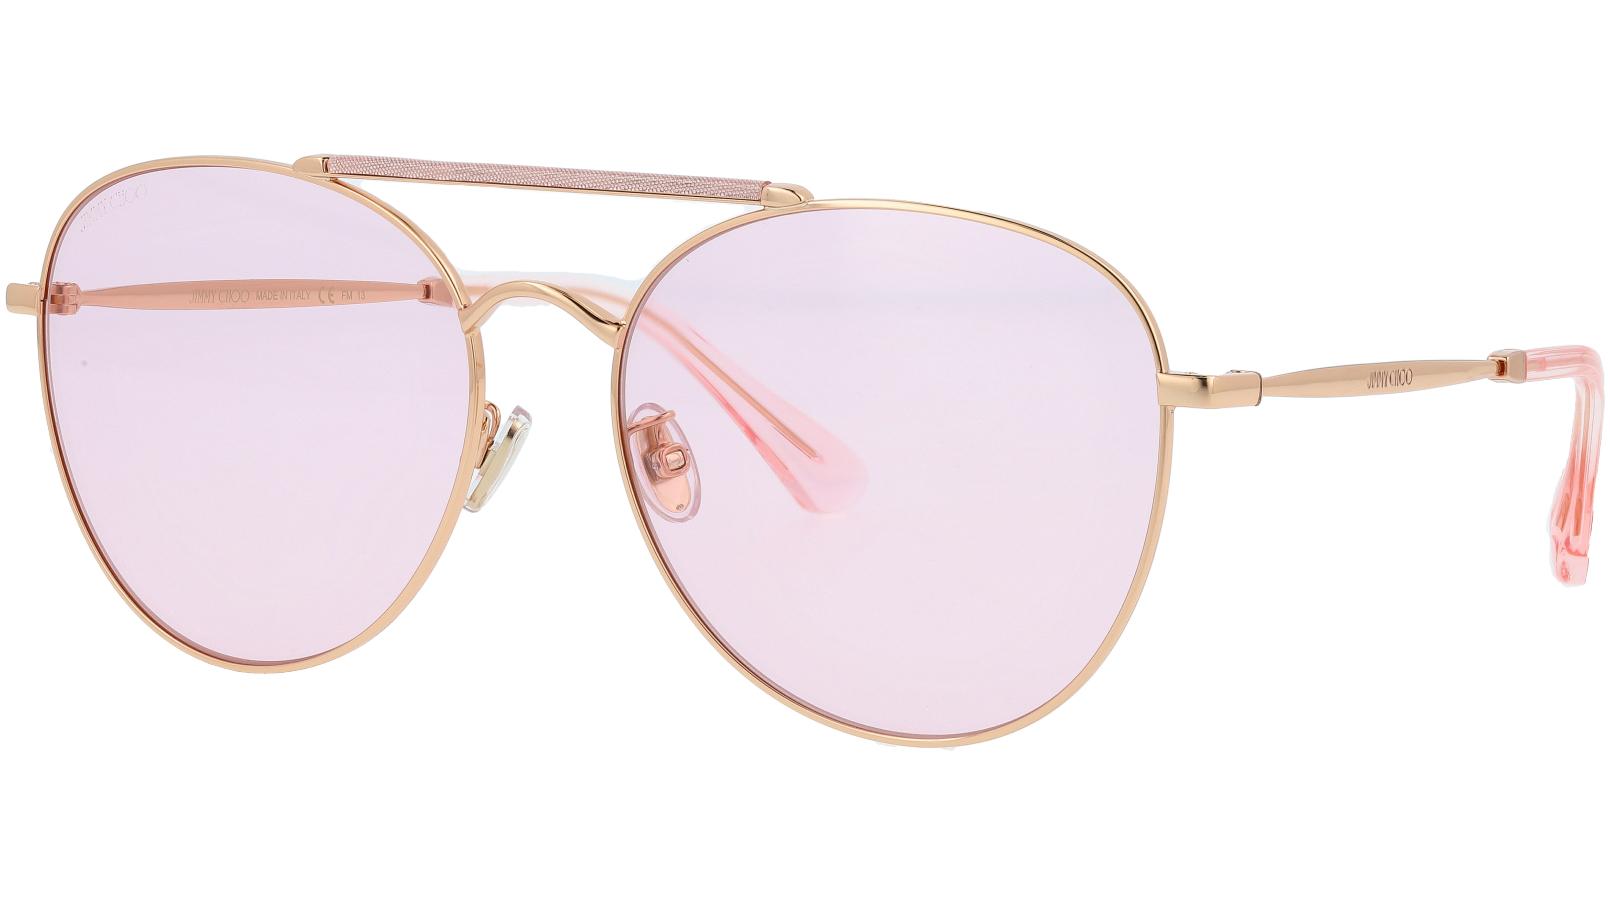 JIMMY CHOO ABBIE/G/S W66Q4 61 PINK Sunglasses